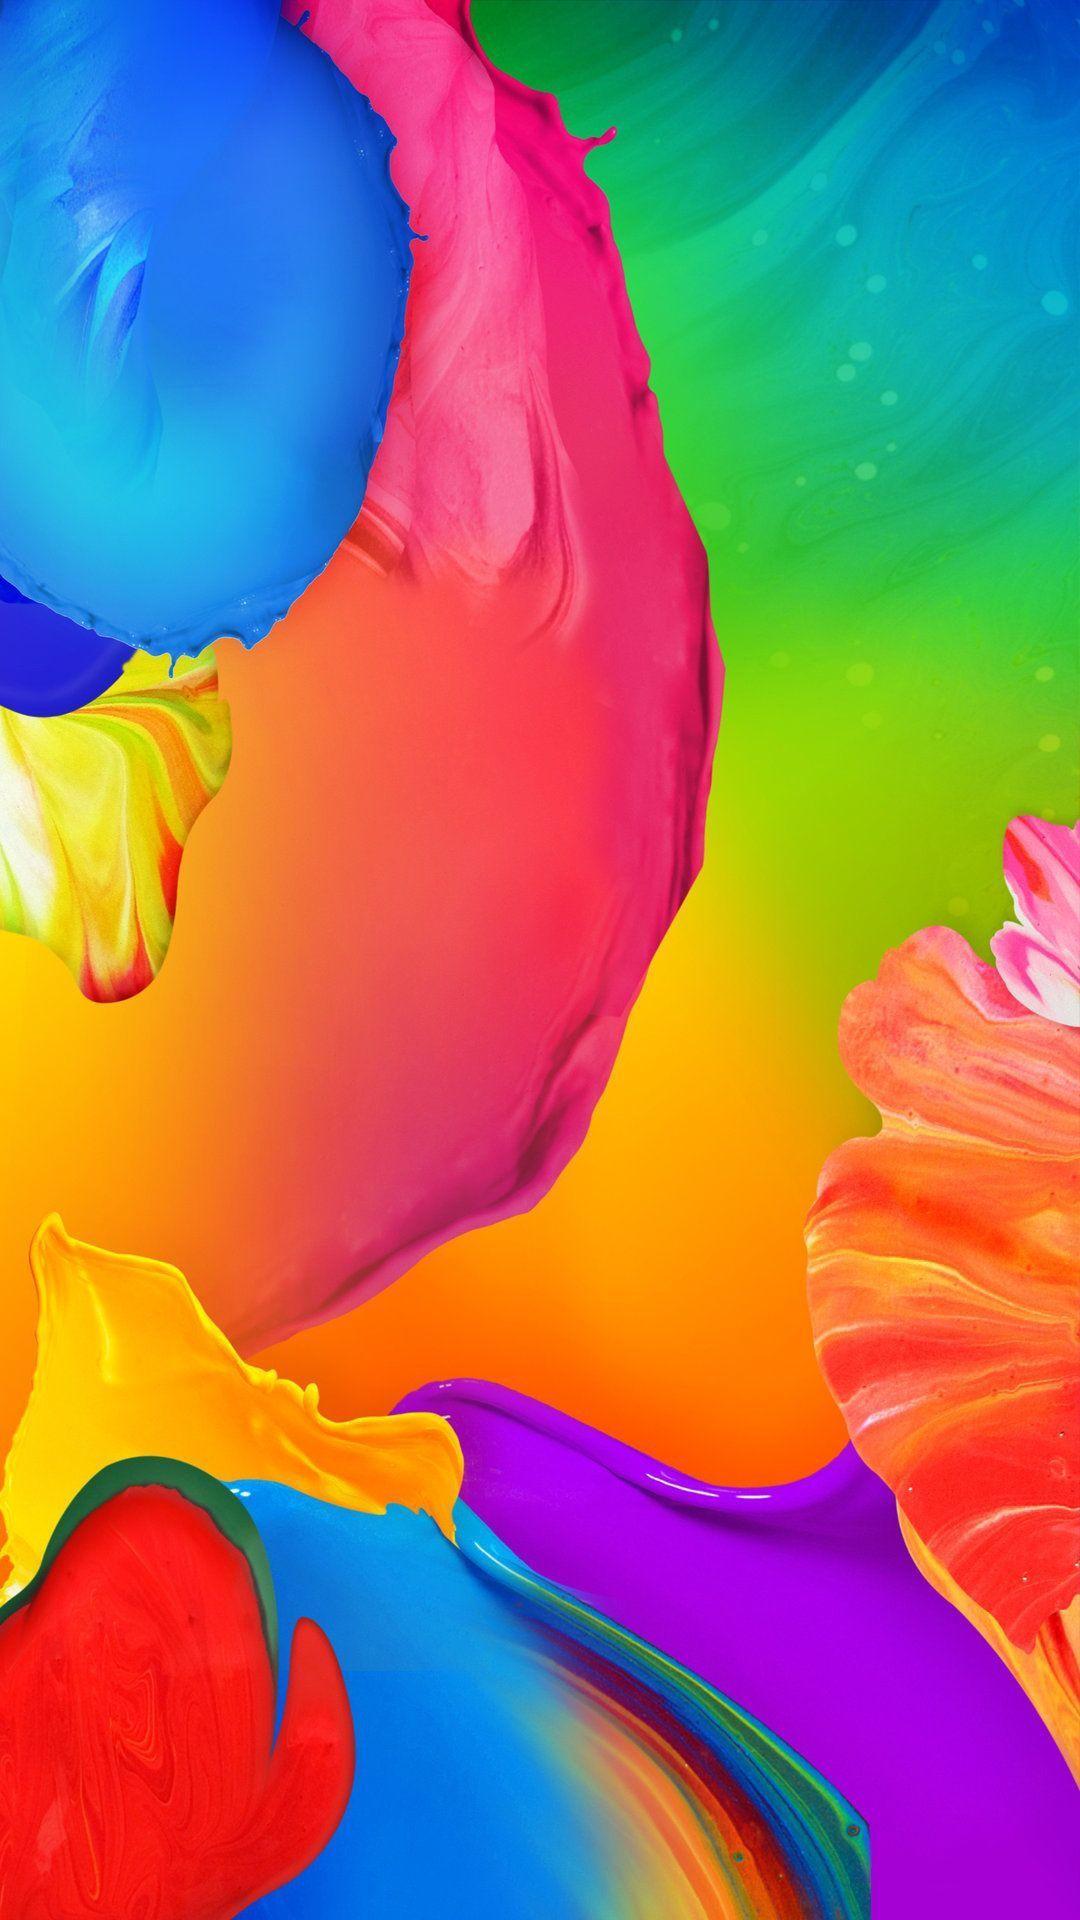 Hd wallpaper vivo - Hd Wallpaper Vivo V5 Painting Colorful Wallpaper Paint Colors Colors And Android